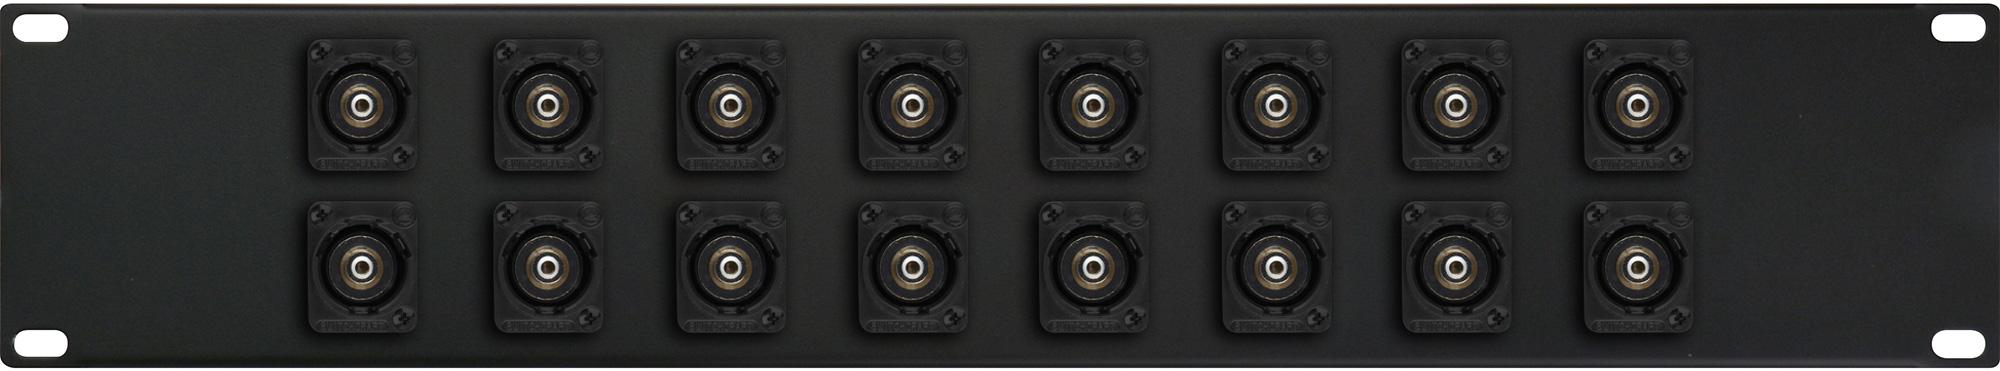 My Custom Shop 16XEHRCABNC-B 16-Port RCA to BNC Feed-Through Patch Panel w/ Black Switchcraft E Series - 2RU 16XEHRCABNC-B